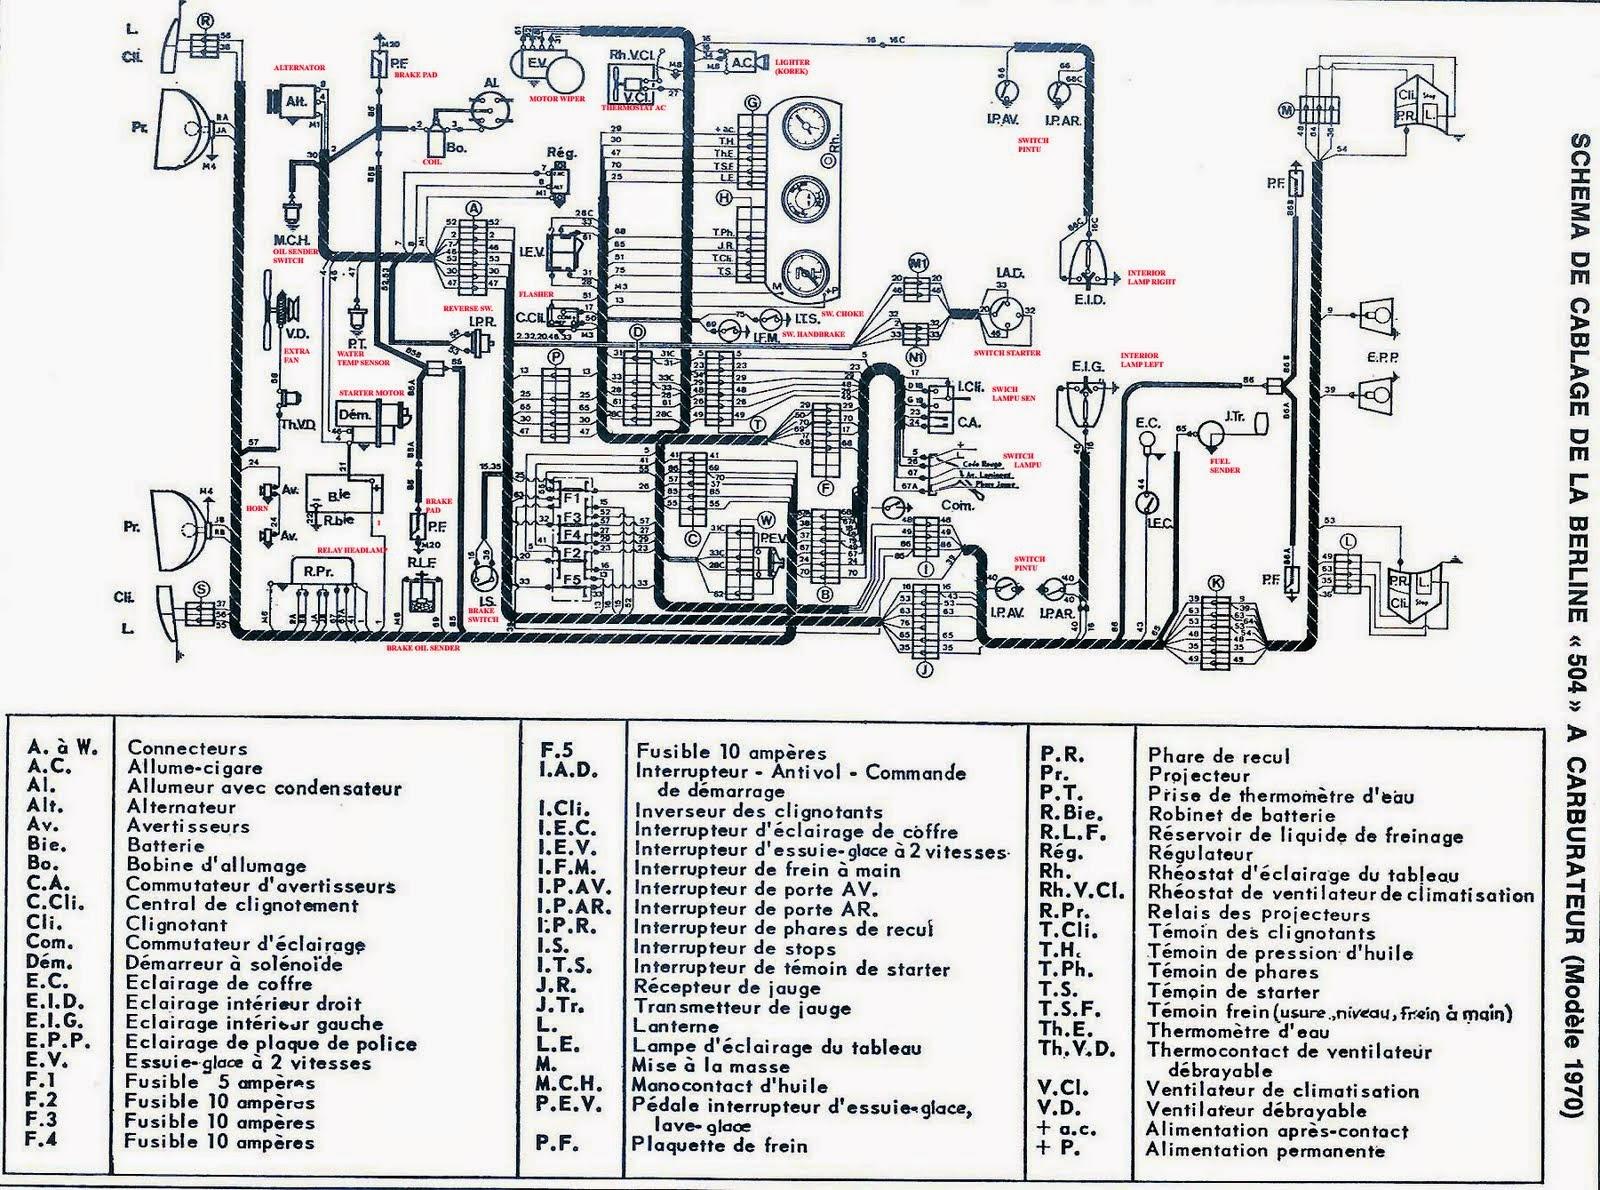 Wiring Diagram Toyota Kijang 5k Cooker Lgx Analisis Dan Evaluasi